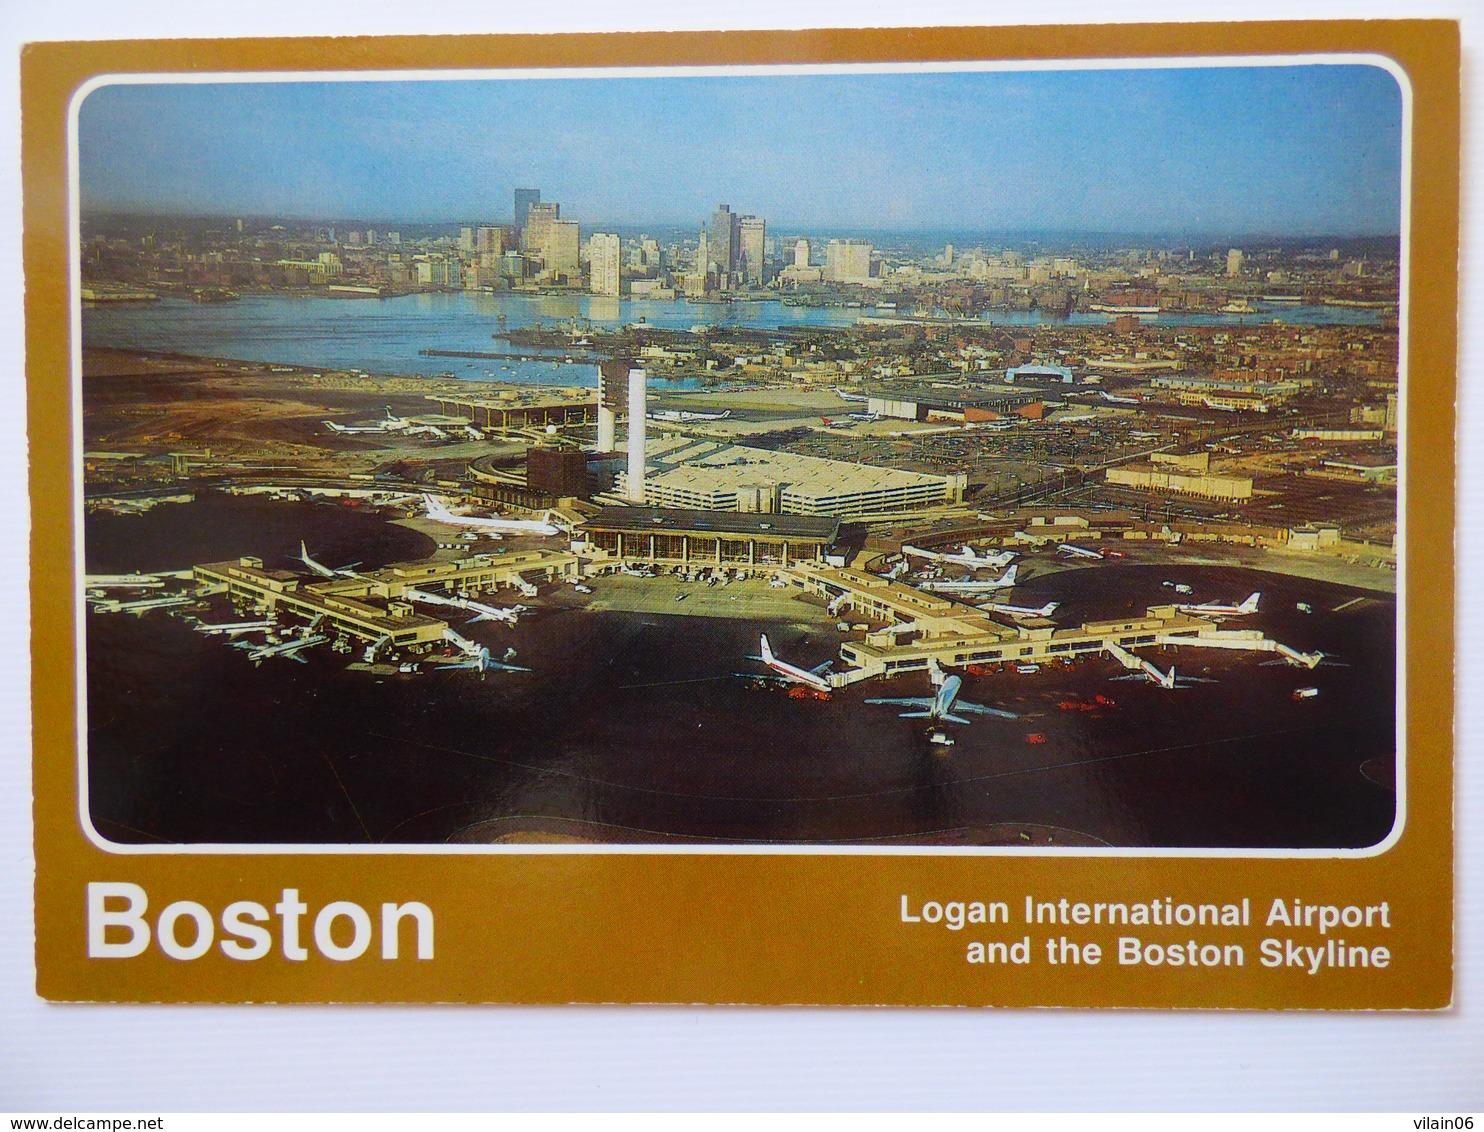 AIRPORT / FLUGHAFEN / AEROPORT     BOSTON LOGAN  INTERNATIONAL - Aeródromos